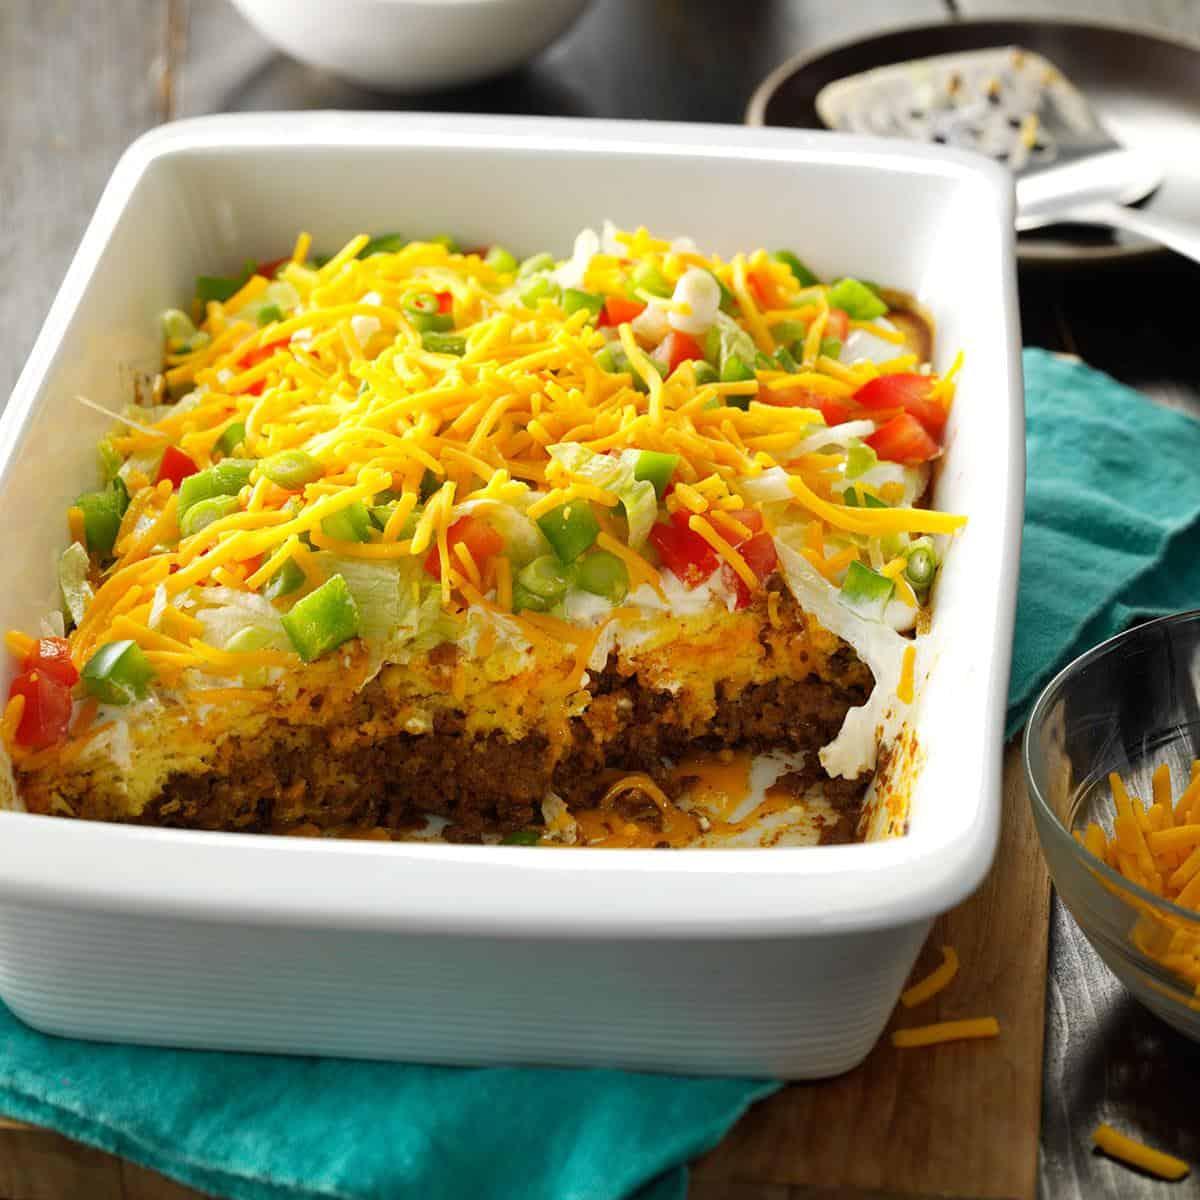 Potluck taco casserole